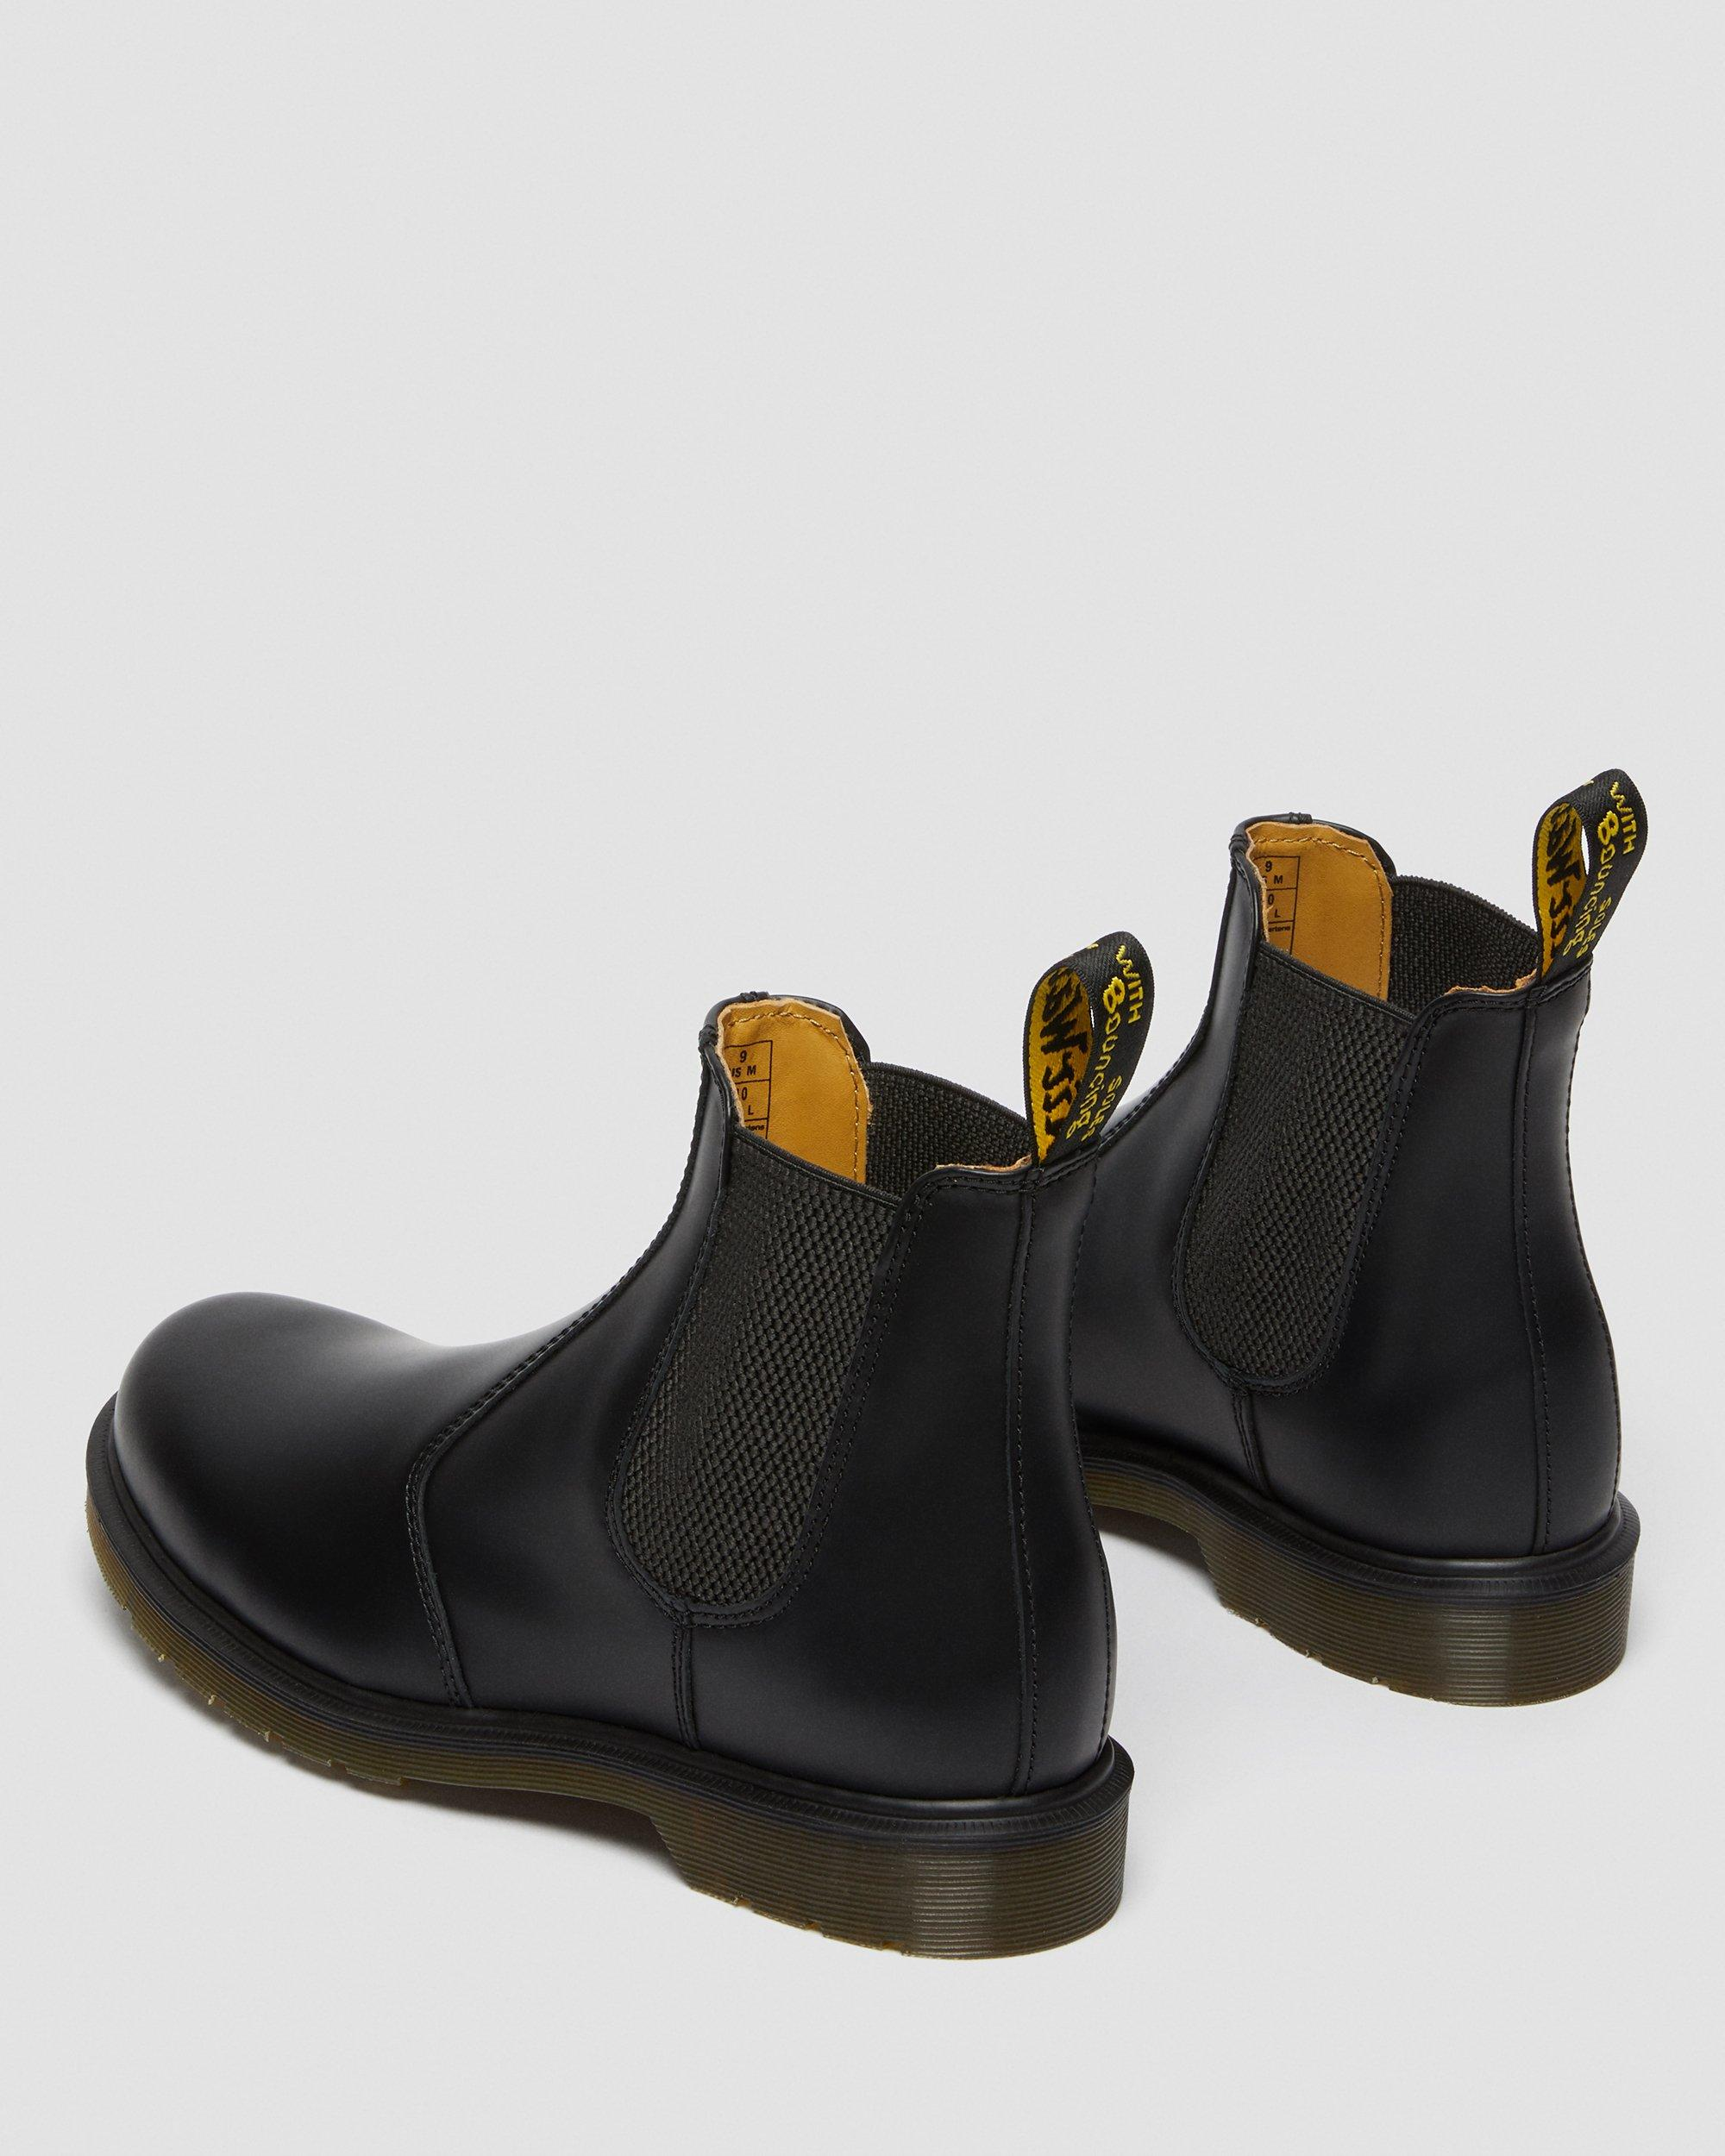 Dr. Martens Chelsea Boots black leather